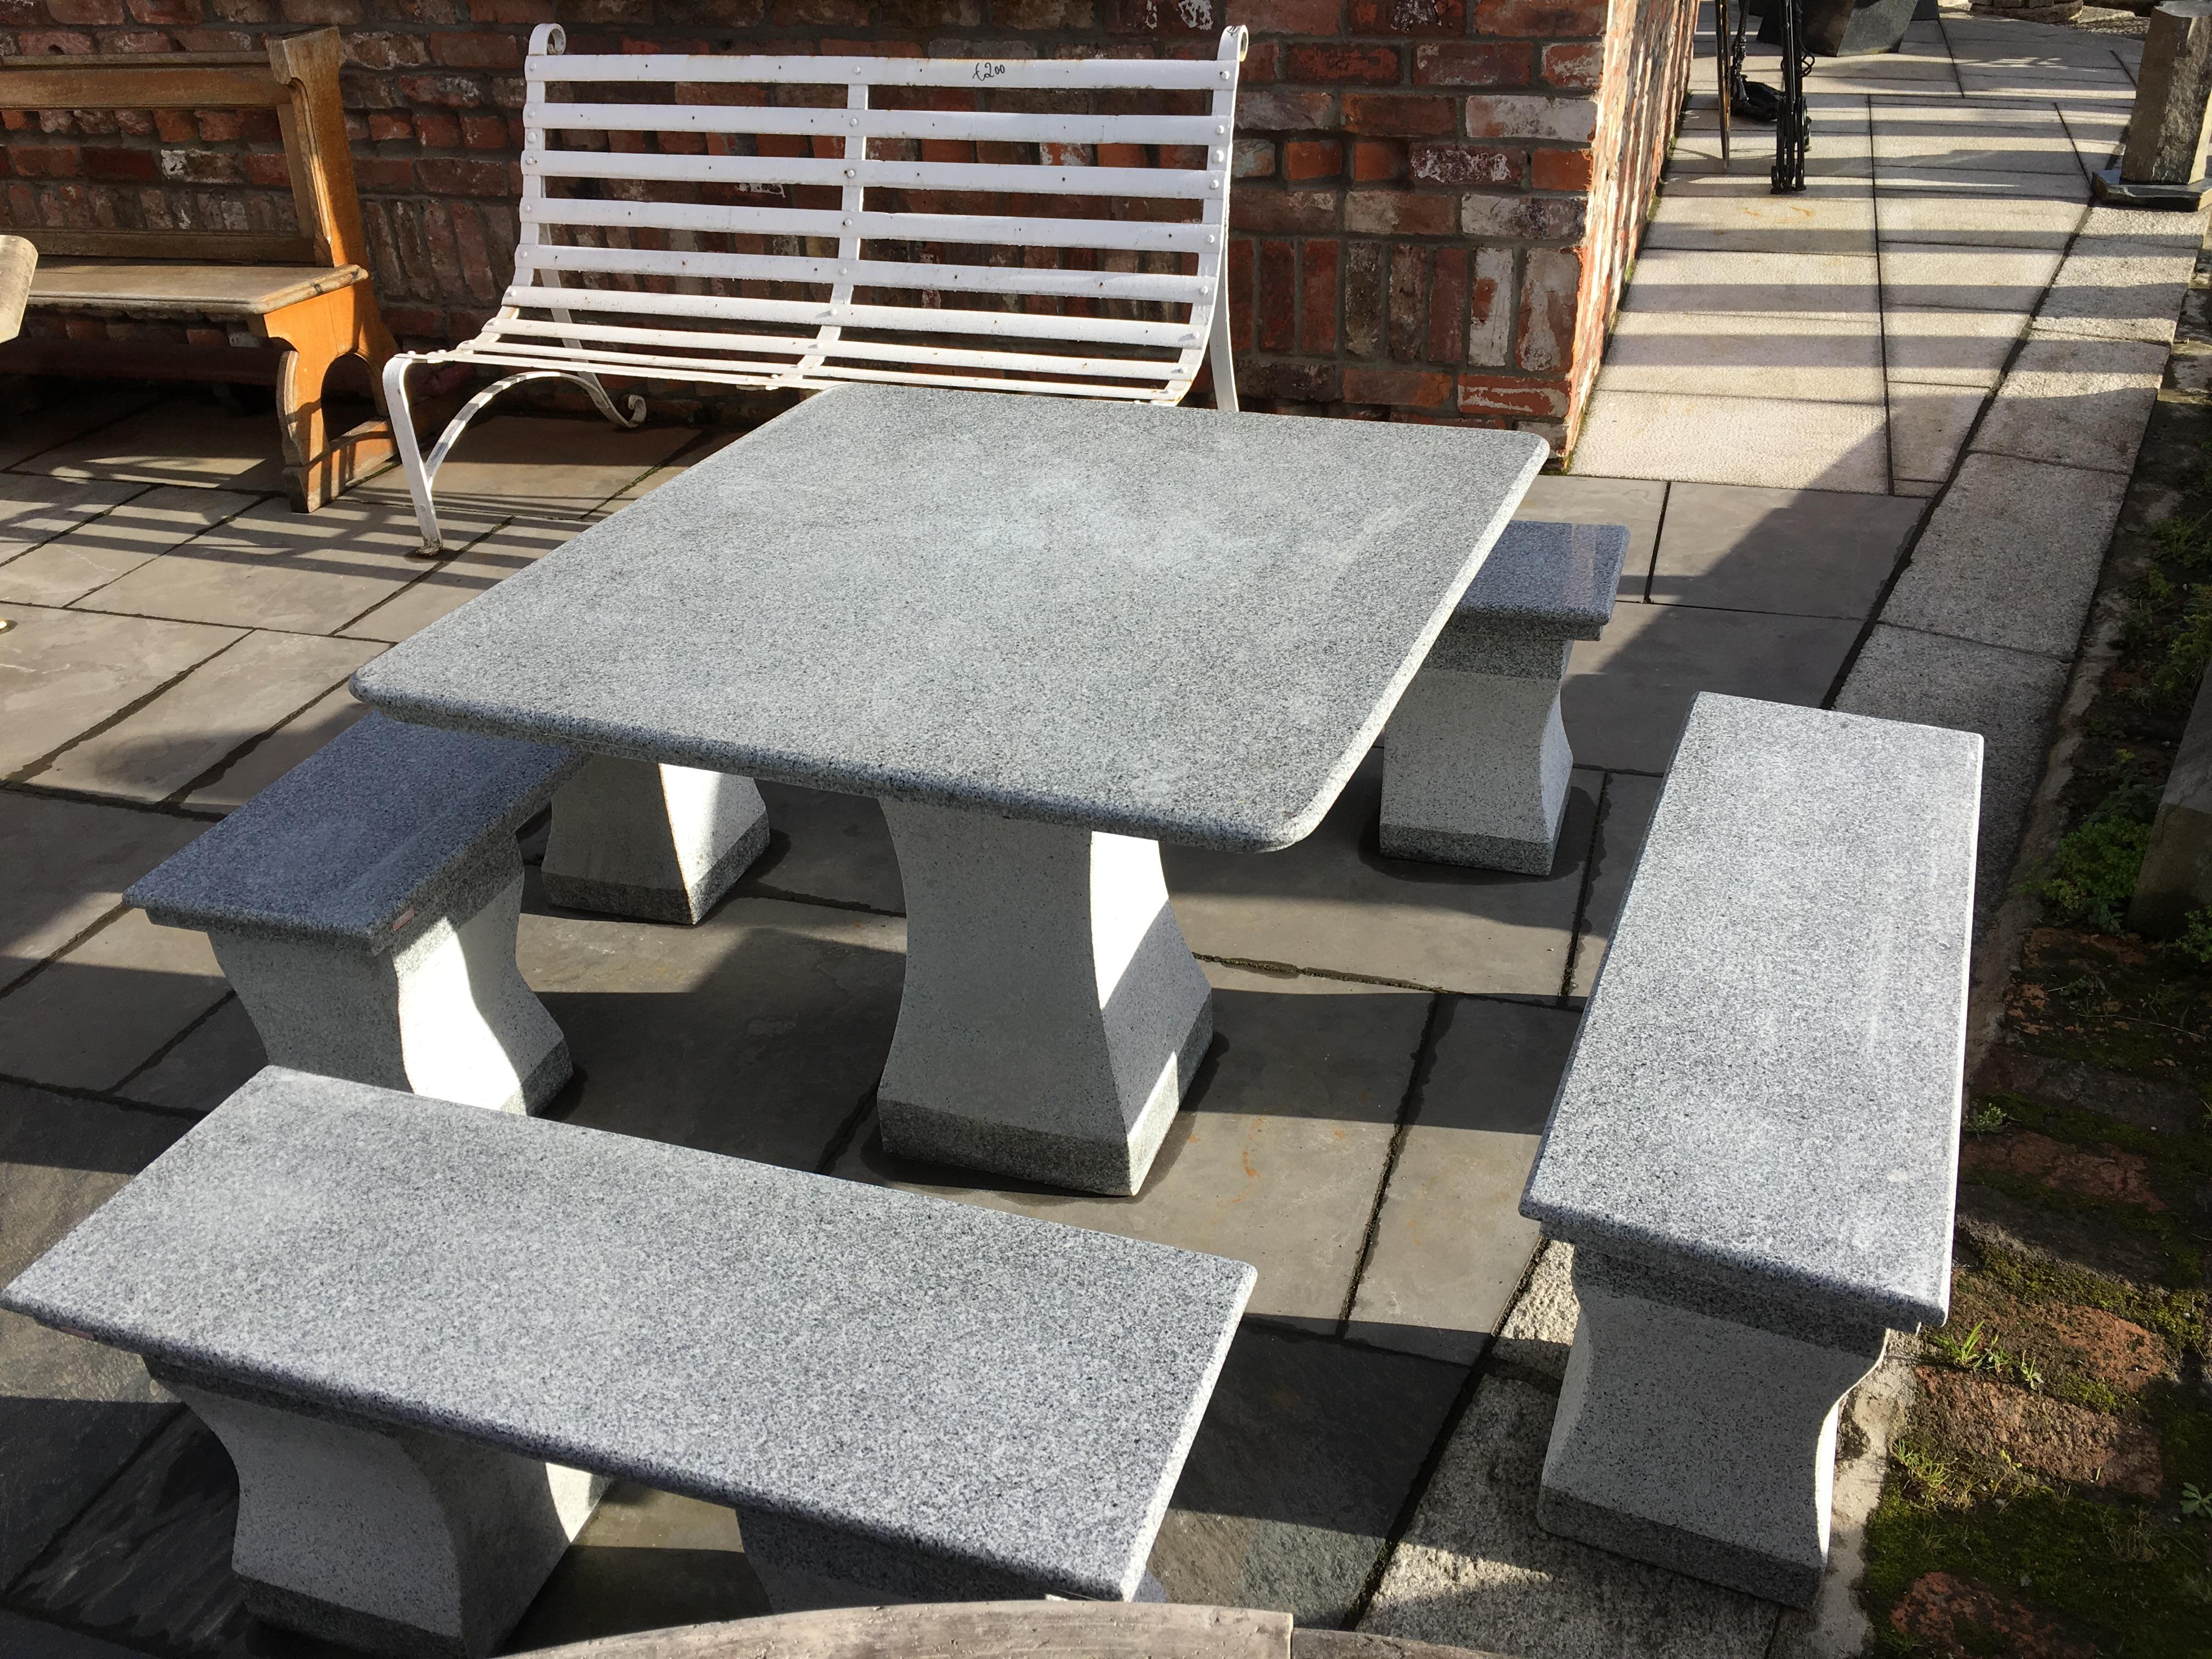 Similar garden furniture products